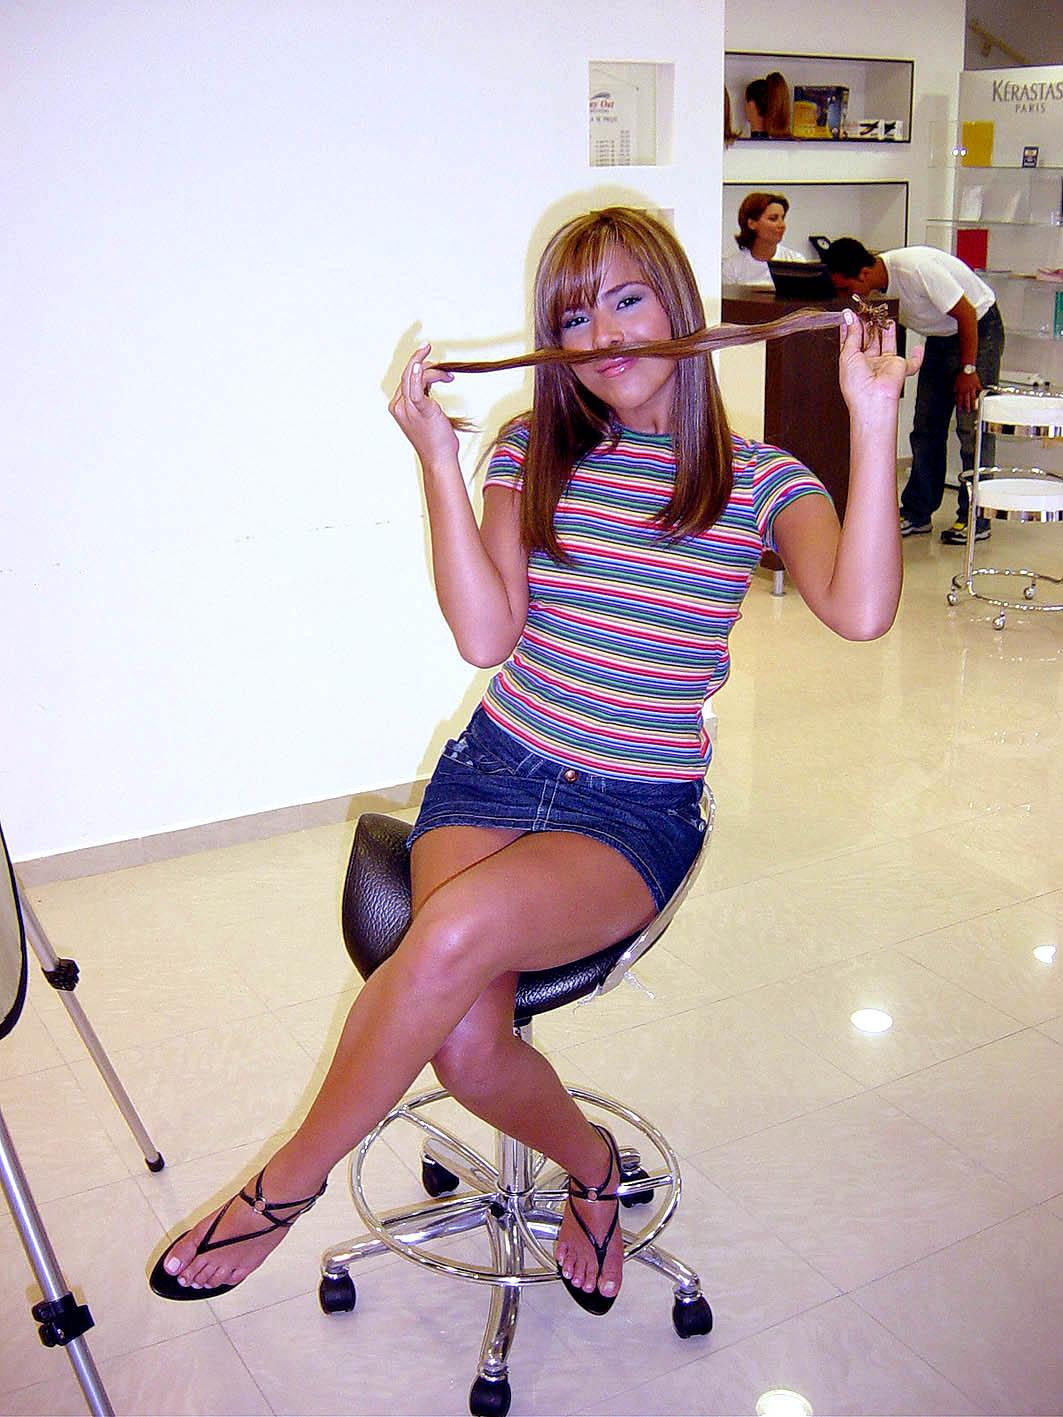 http://4.bp.blogspot.com/_UaLWp72nij4/THbT4GVL4YI/AAAAAAAAUFg/n7XZwHf7ZB0/s1600/wanessa-camargo-feet-5.jpg